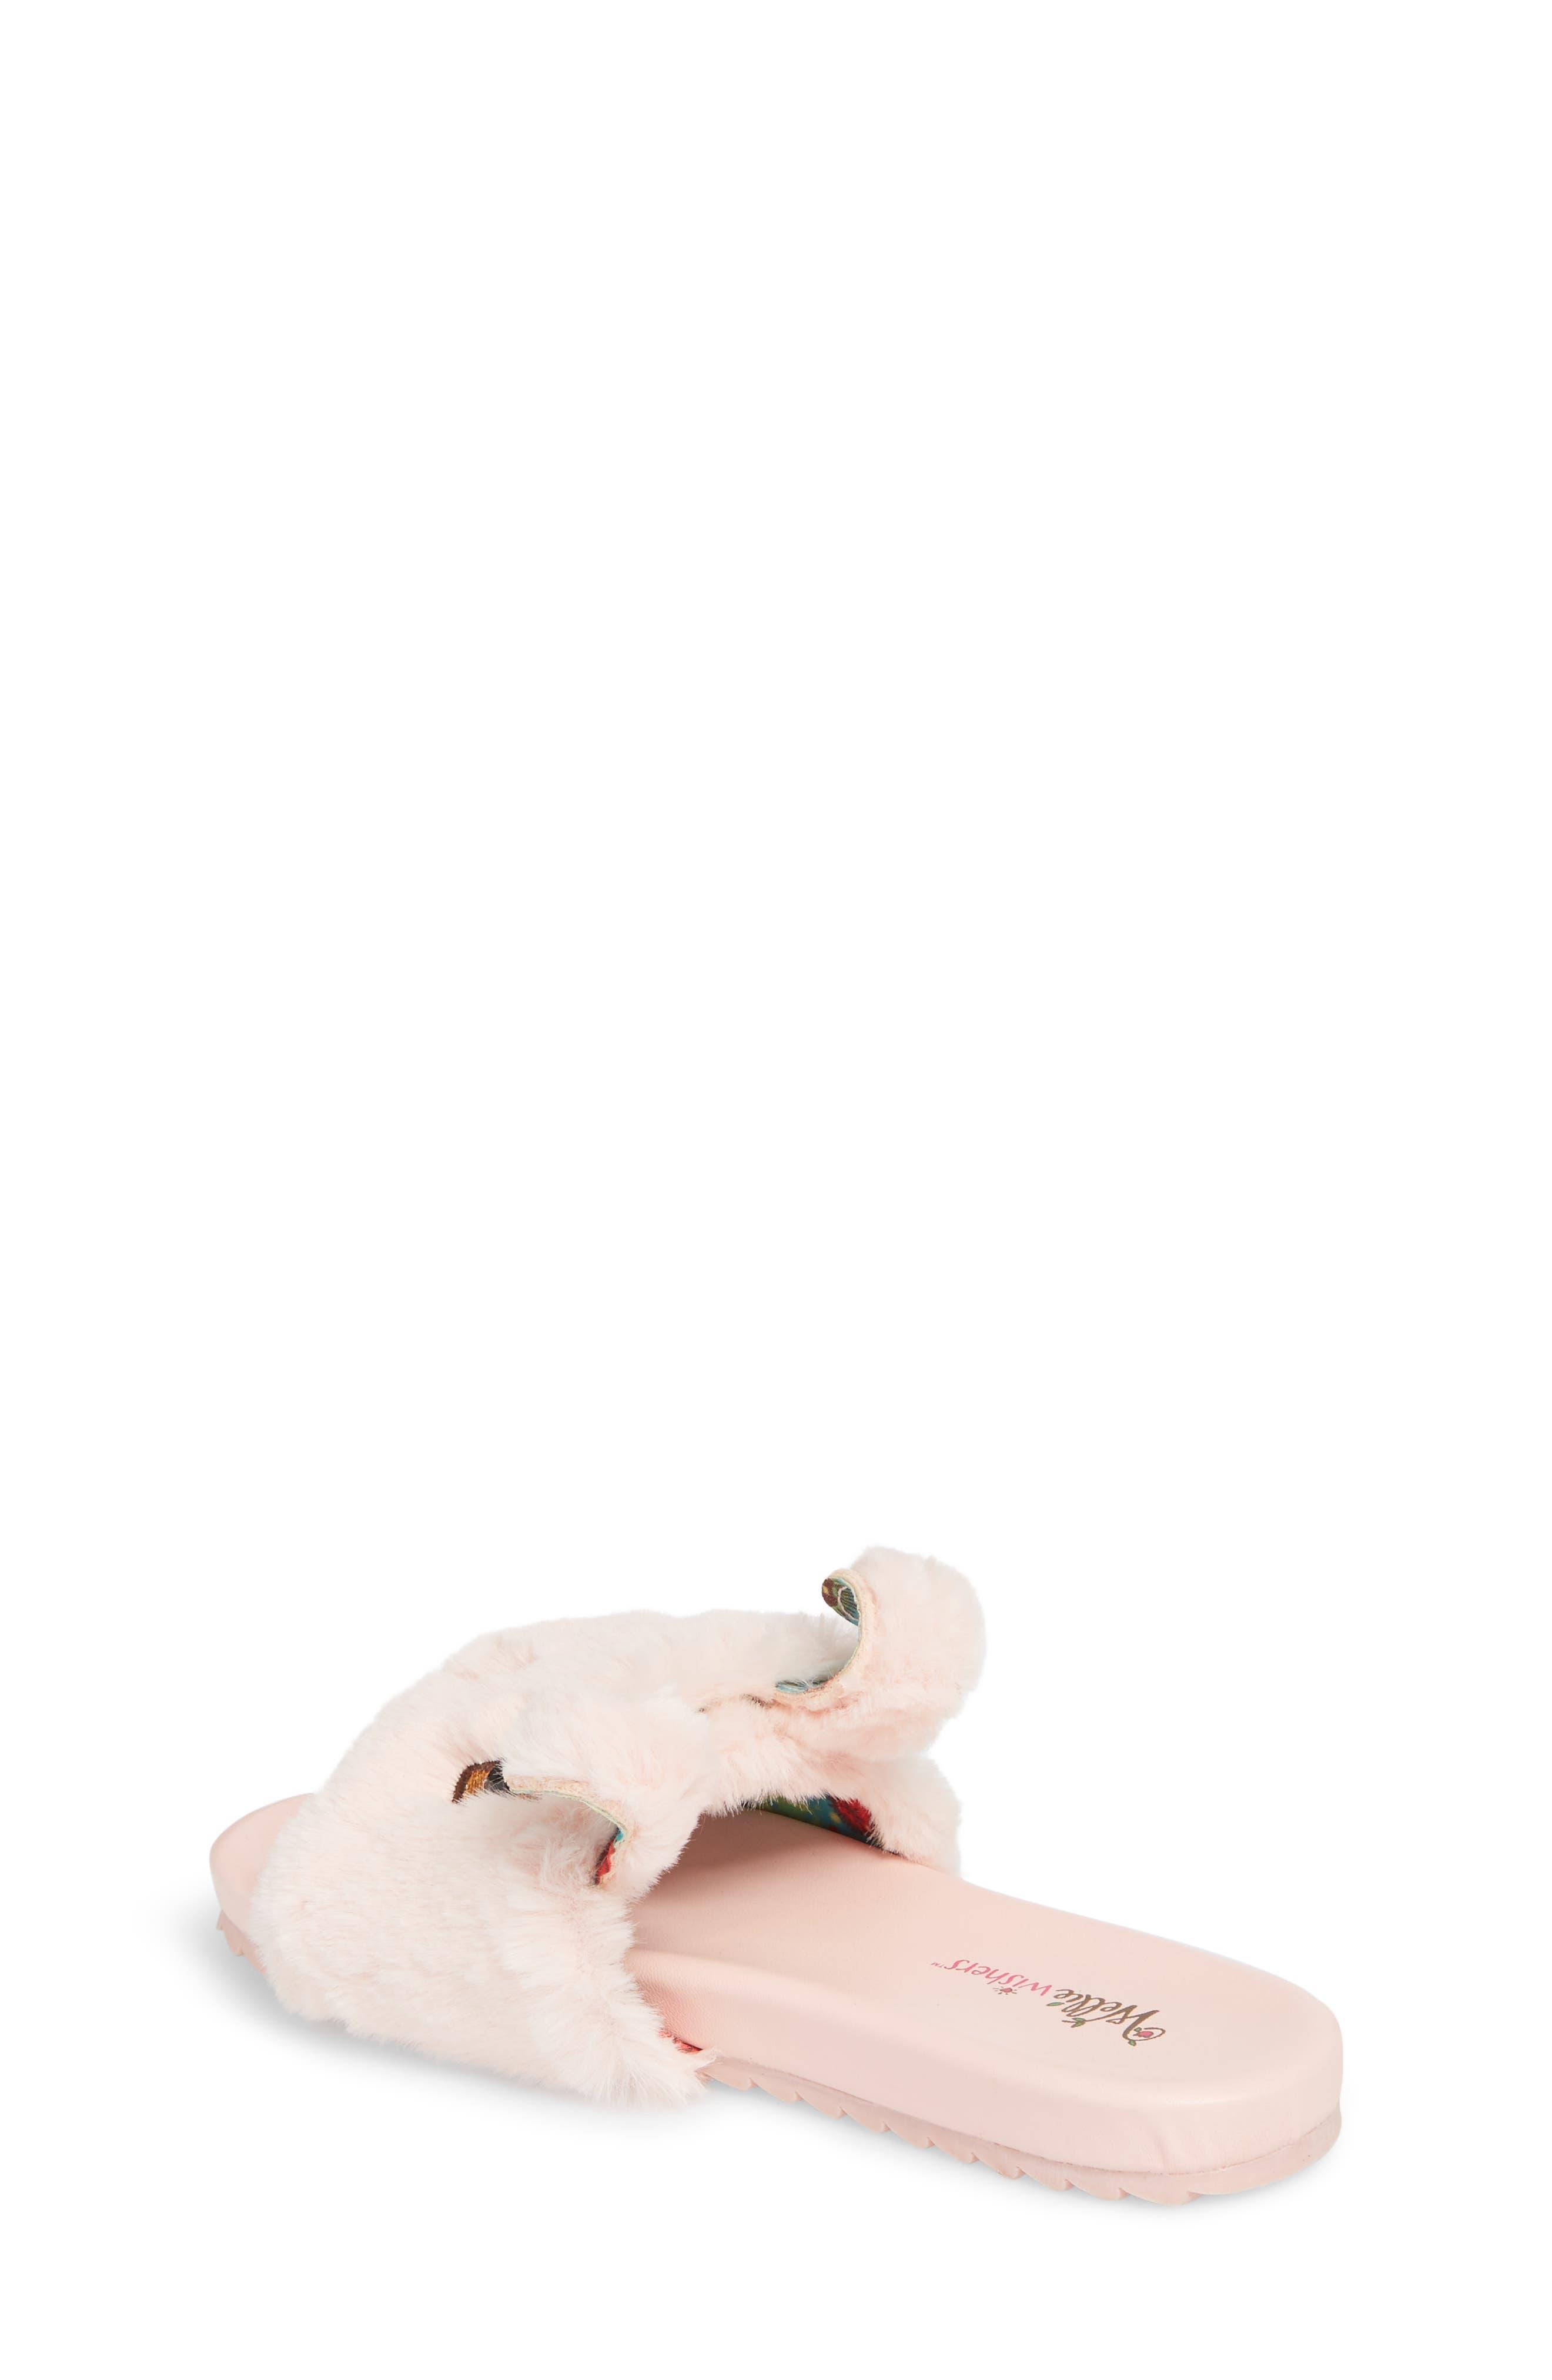 Willa Carrot Faux Fur Slide Sandal,                             Alternate thumbnail 2, color,                             650